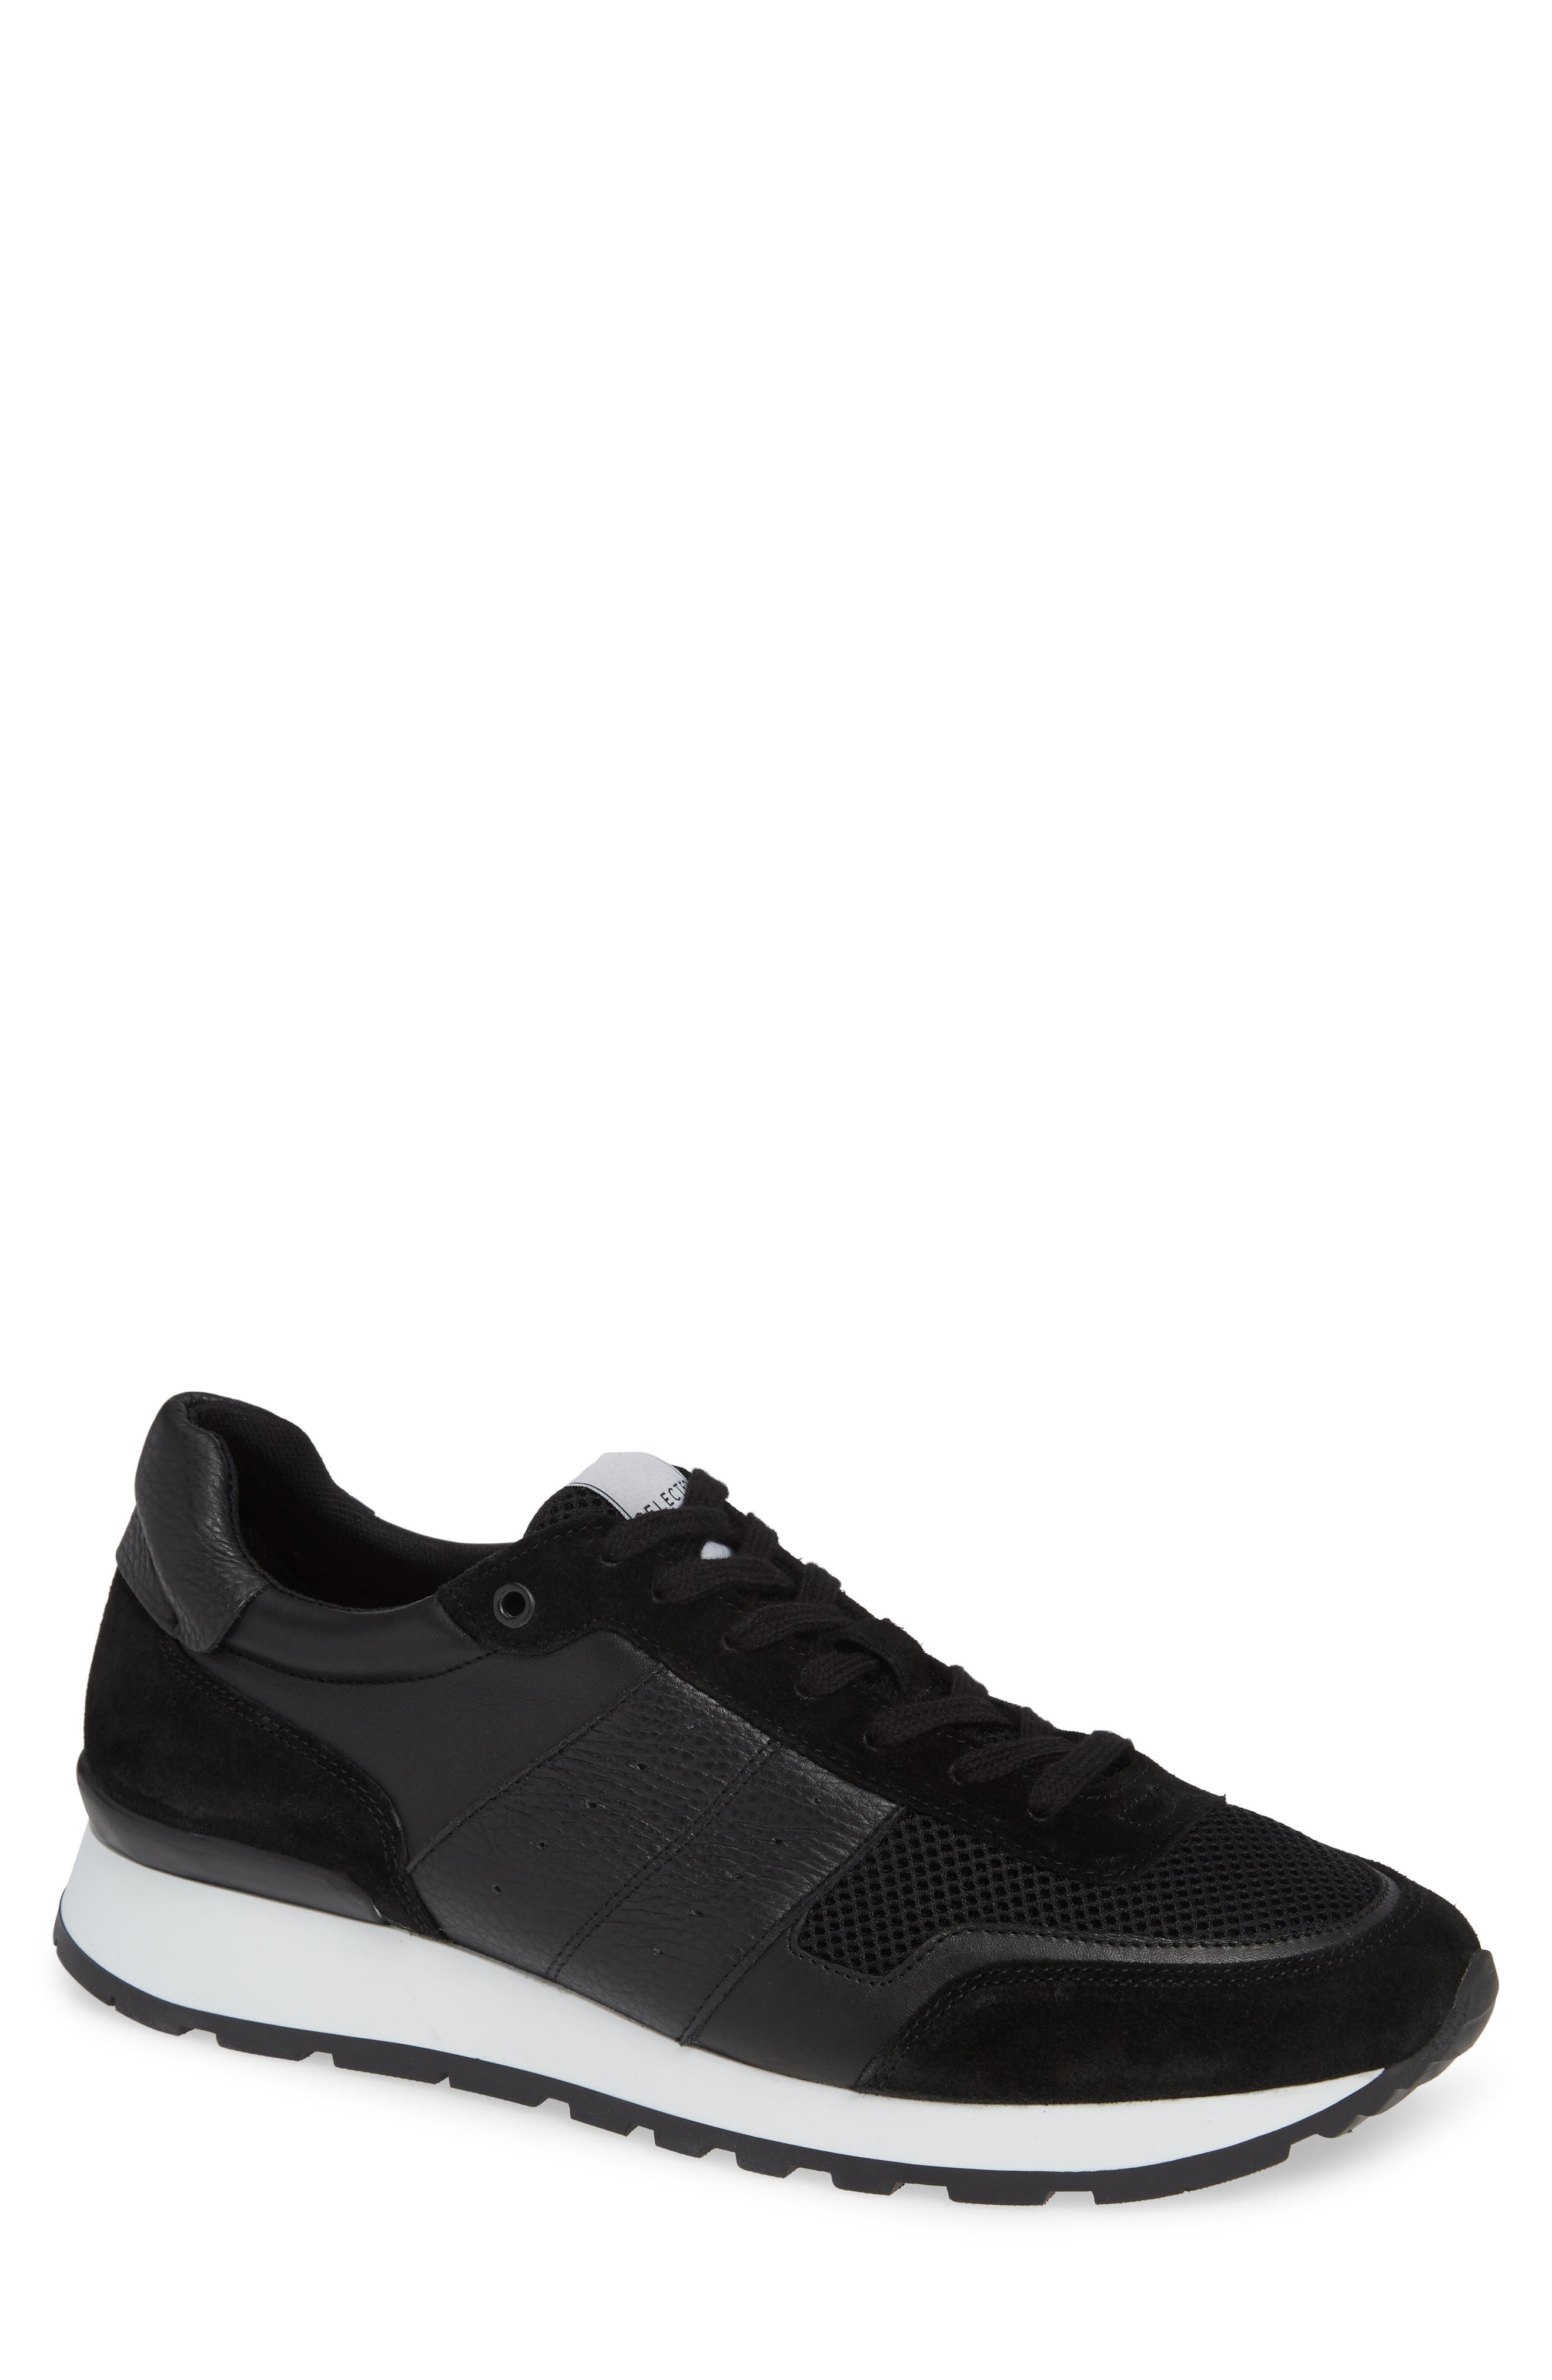 Frank Mix Runner Sneaker,                         Main,                         color, BLACK